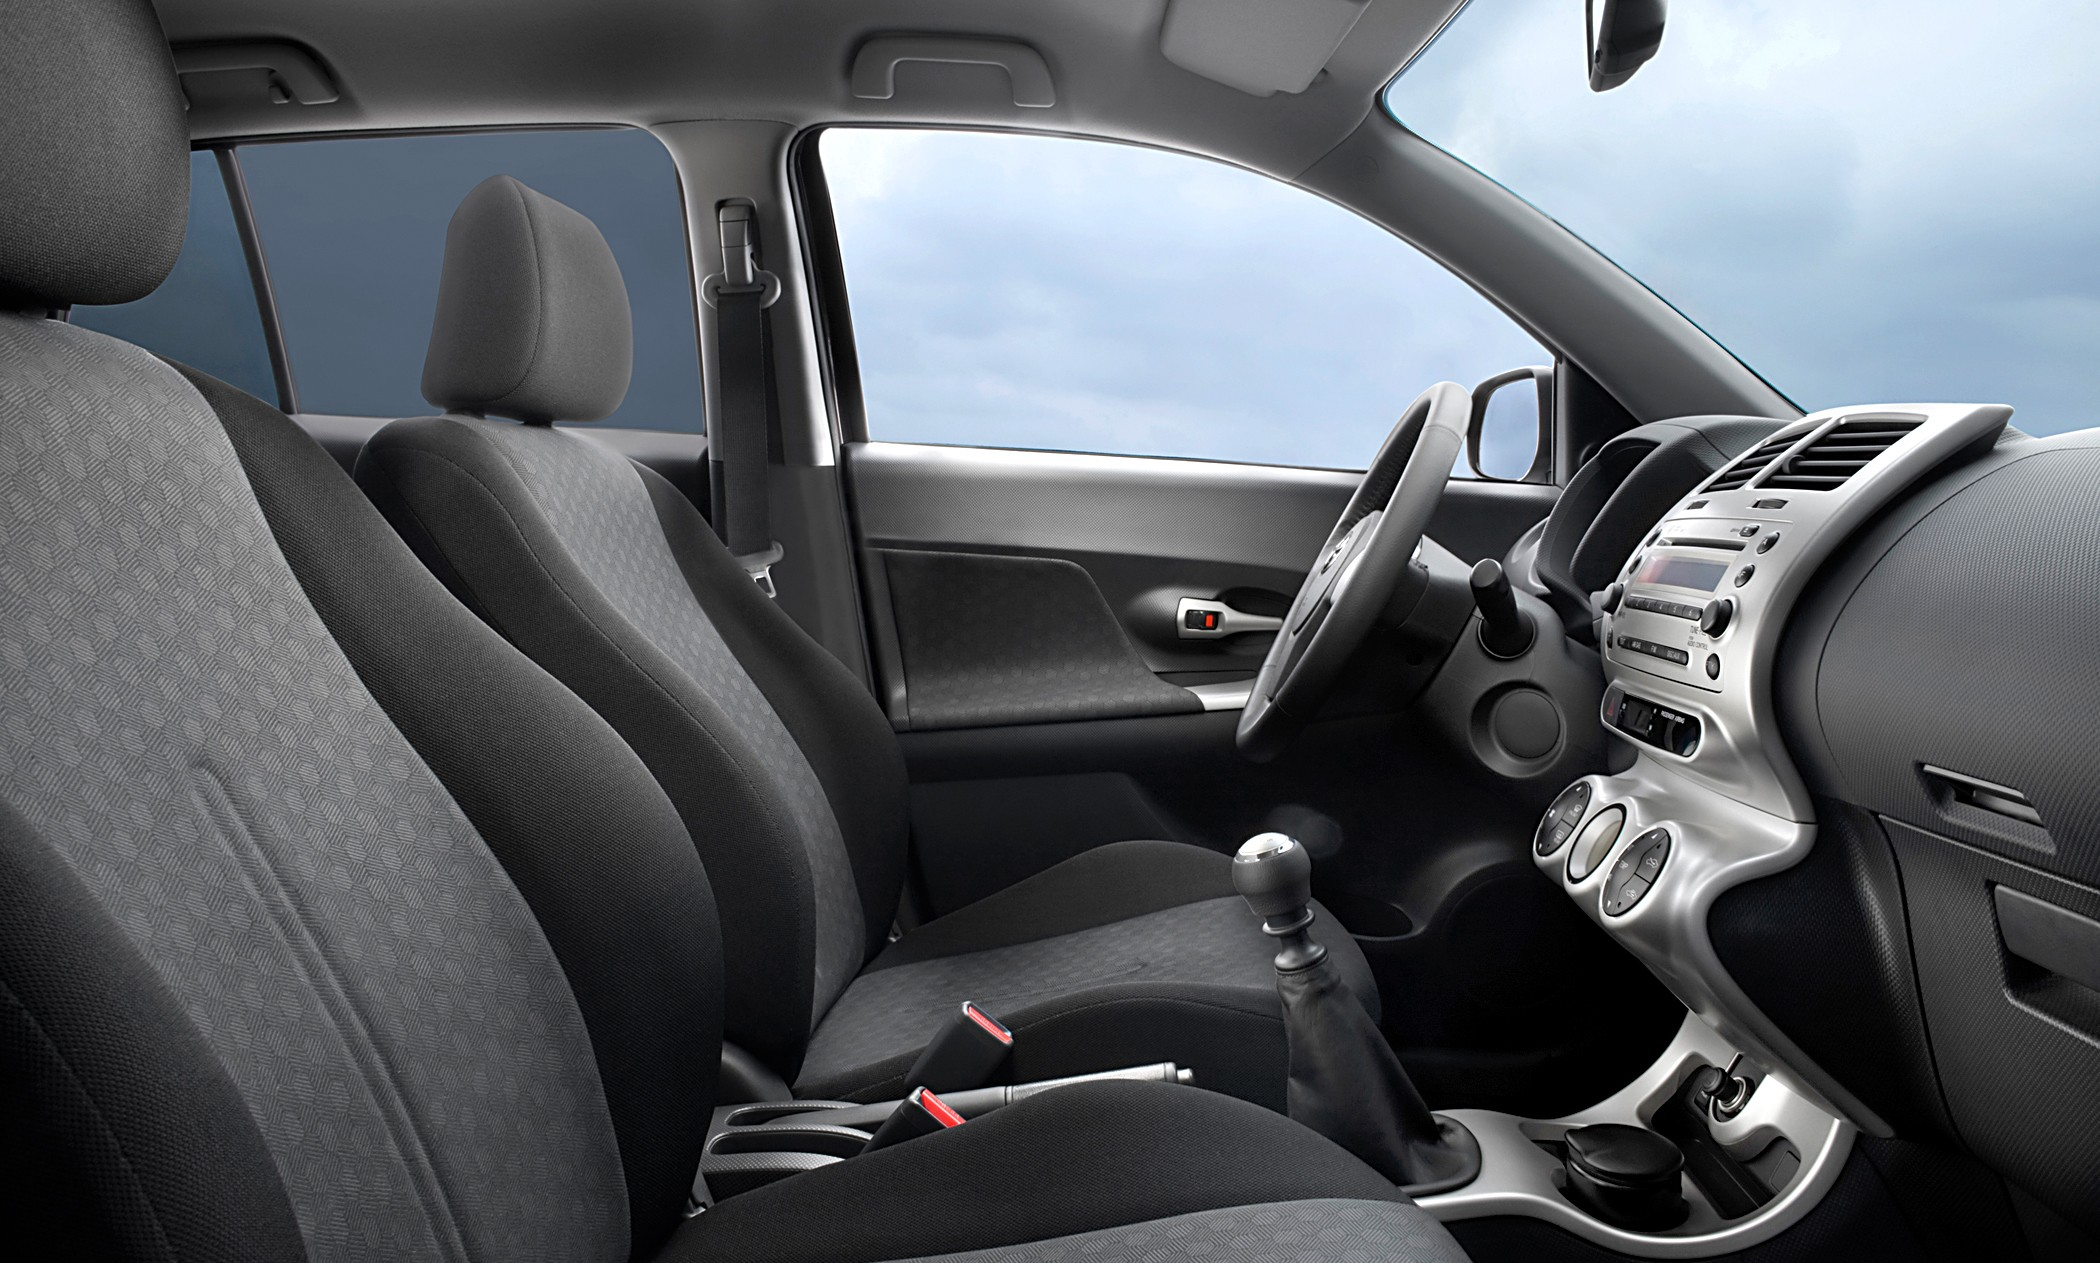 Toyota Urban Cruiser 2009 - 2014 Hatchback 5 door #5